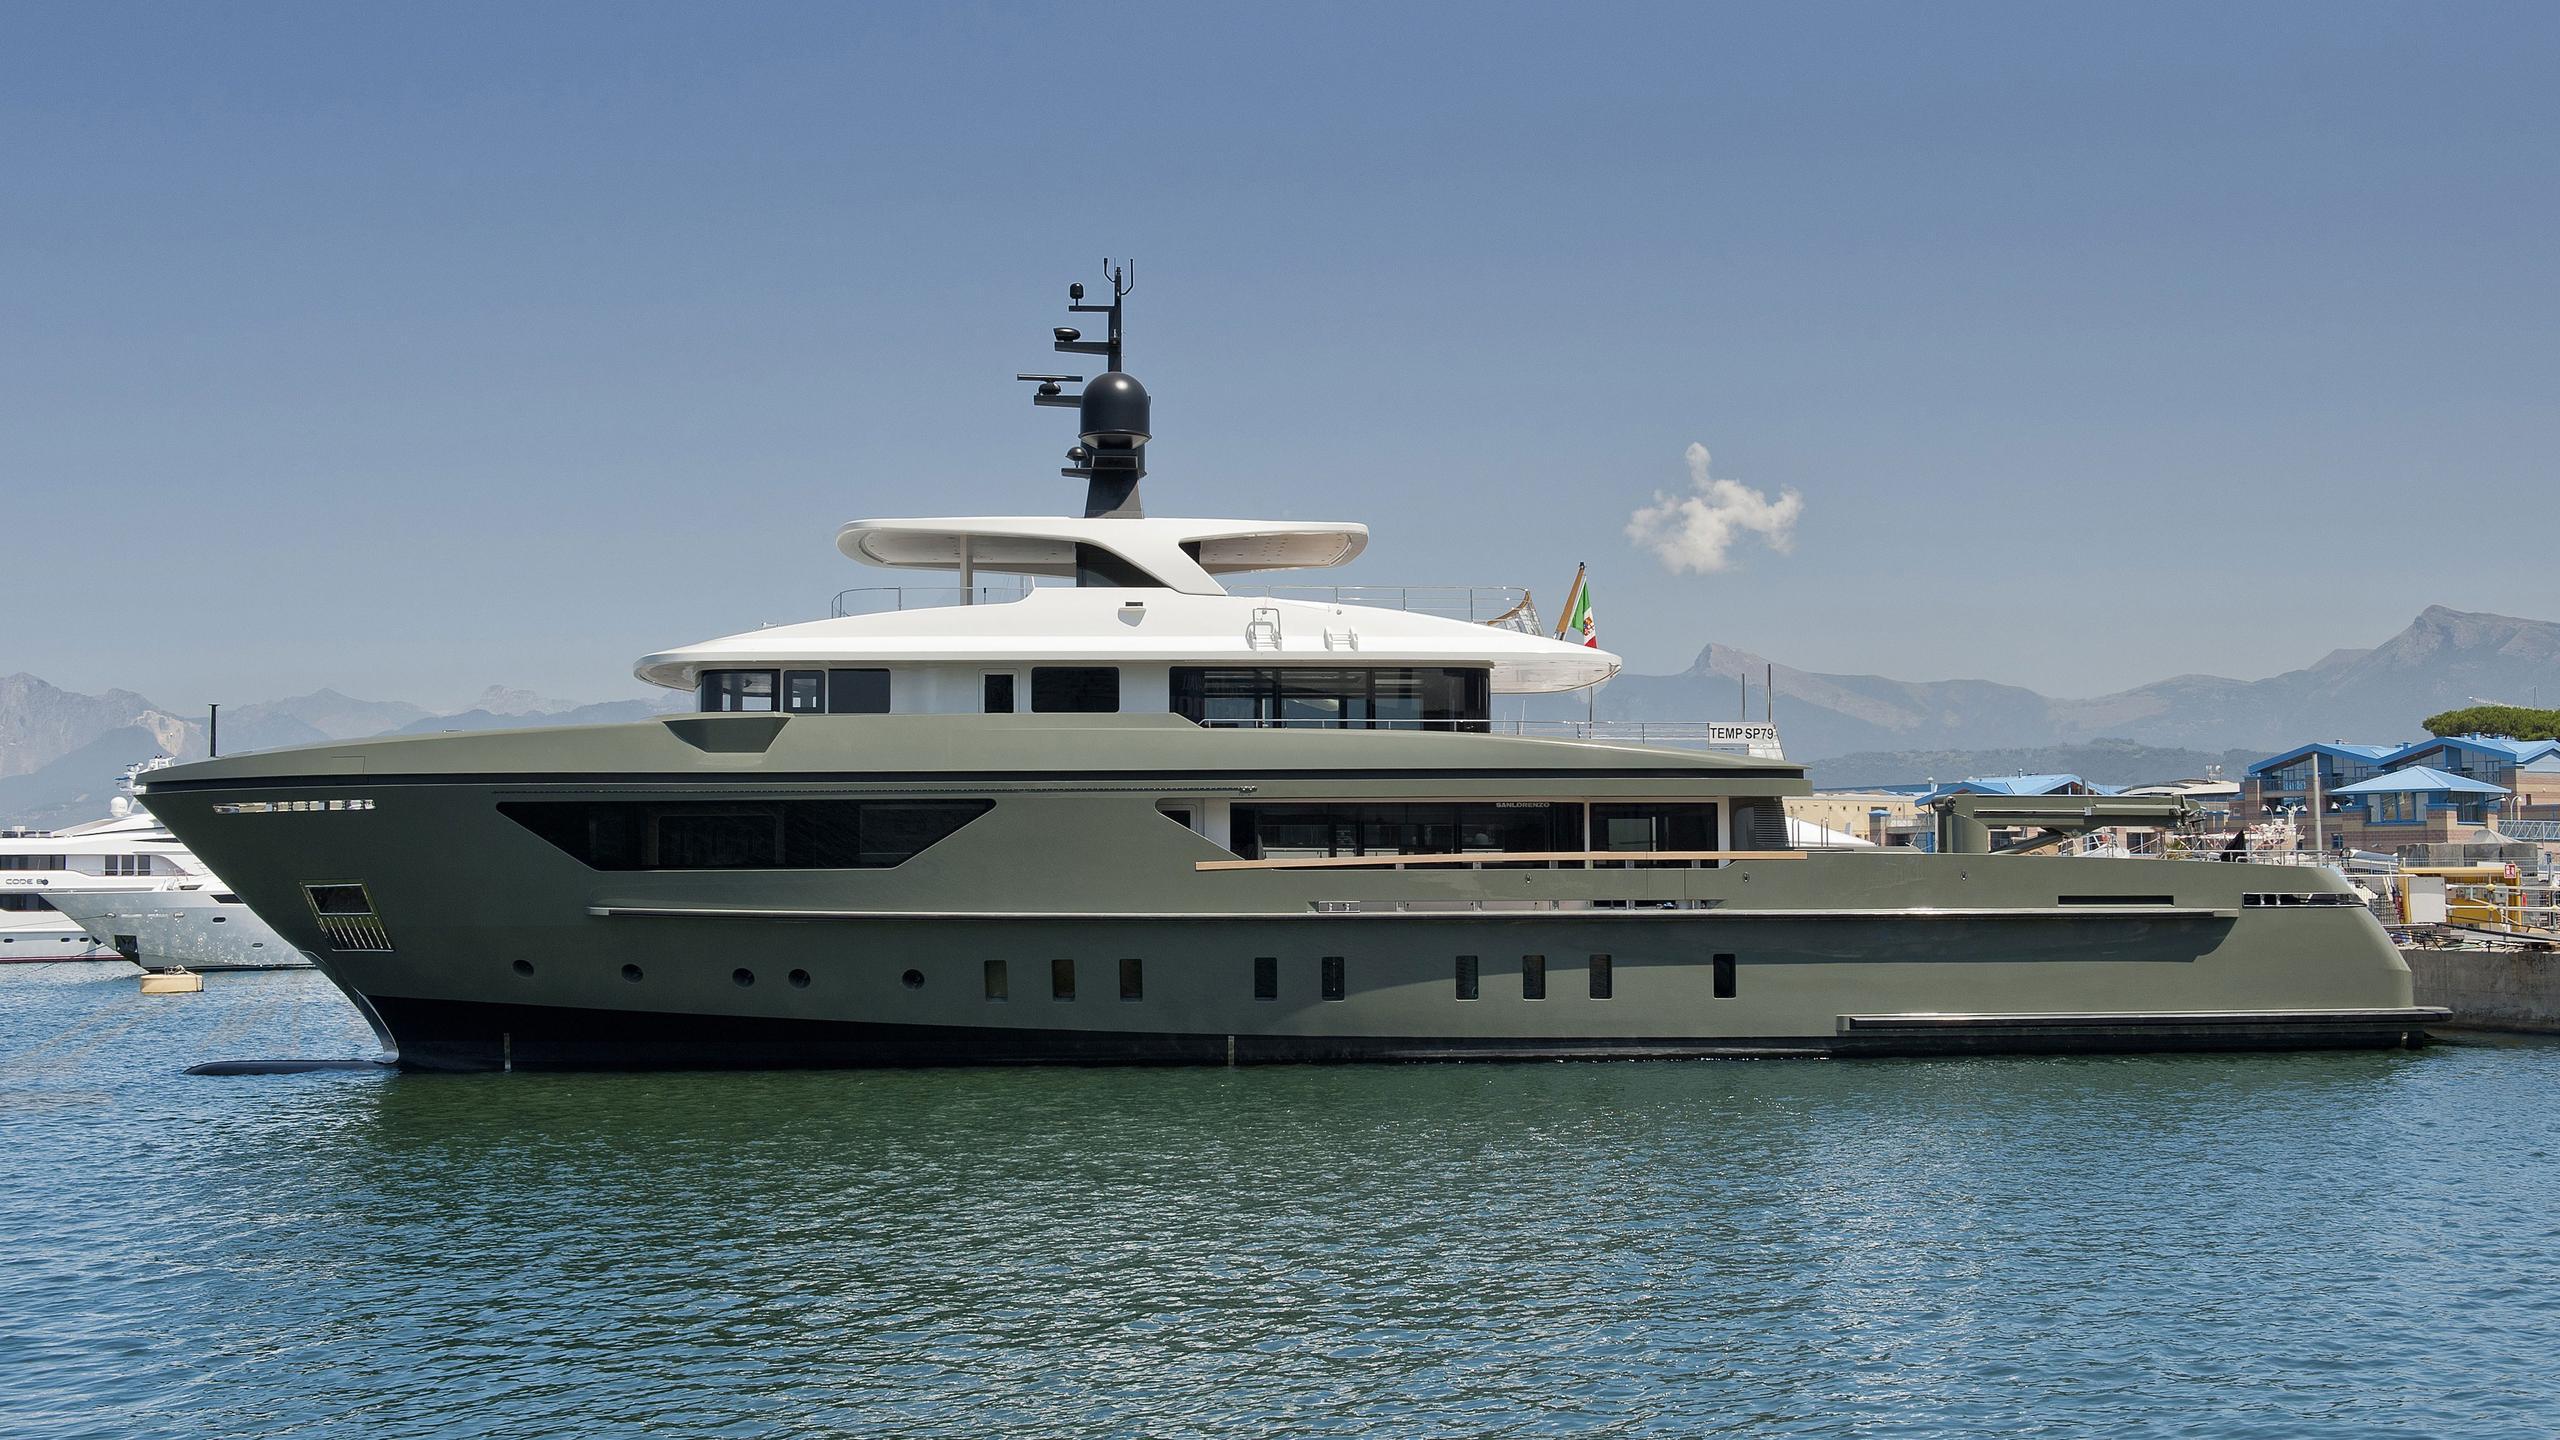 moka-expedition-motor-yacht-sanlorenzo-460-exp-2015-42m-profile